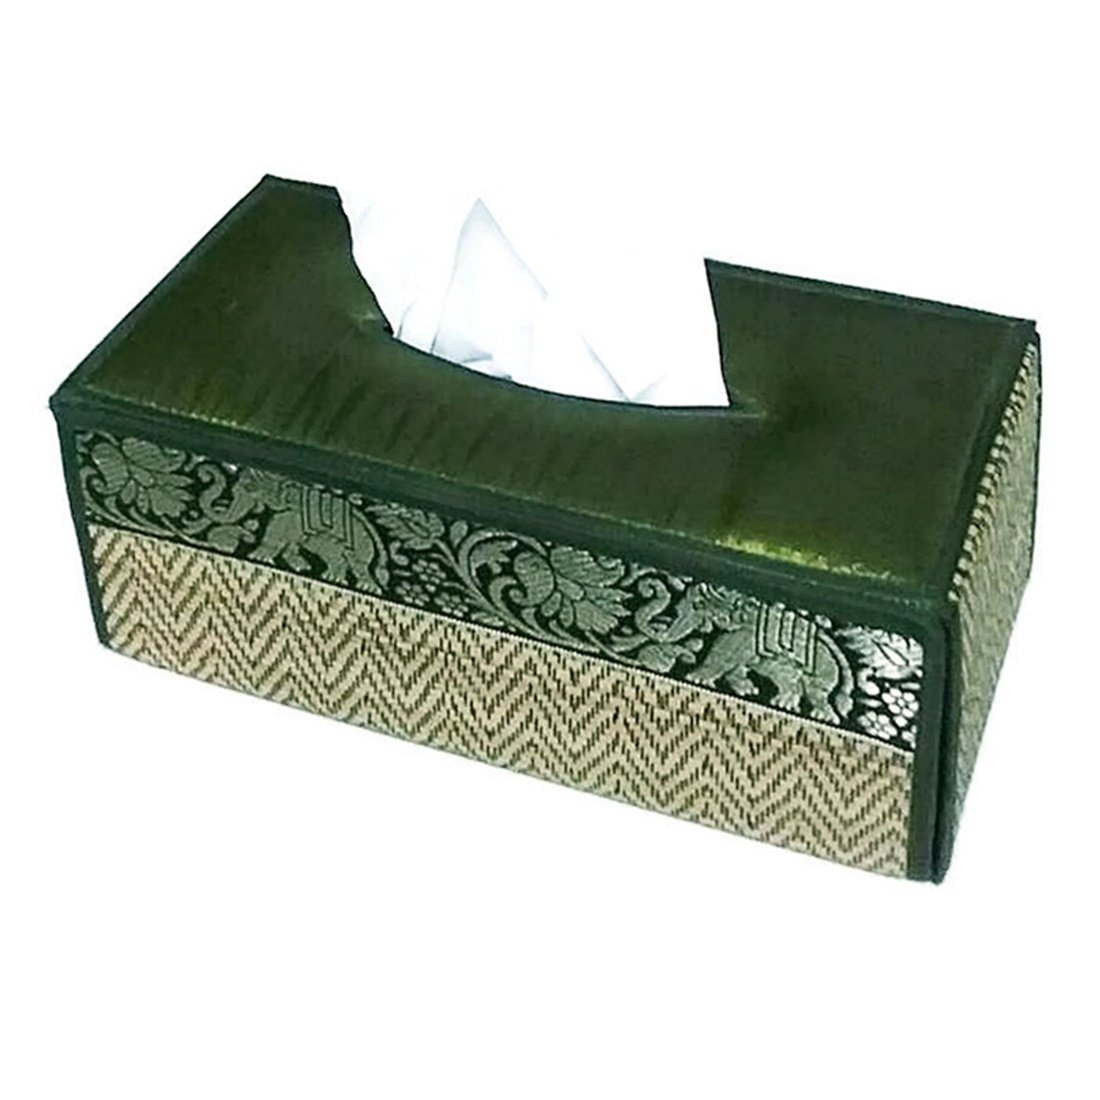 chantubtimplaza Tissue Box Cover Thai Handicraft Elephant Silk Reed Green Color Handmade Home Decor by chantubtimplaza